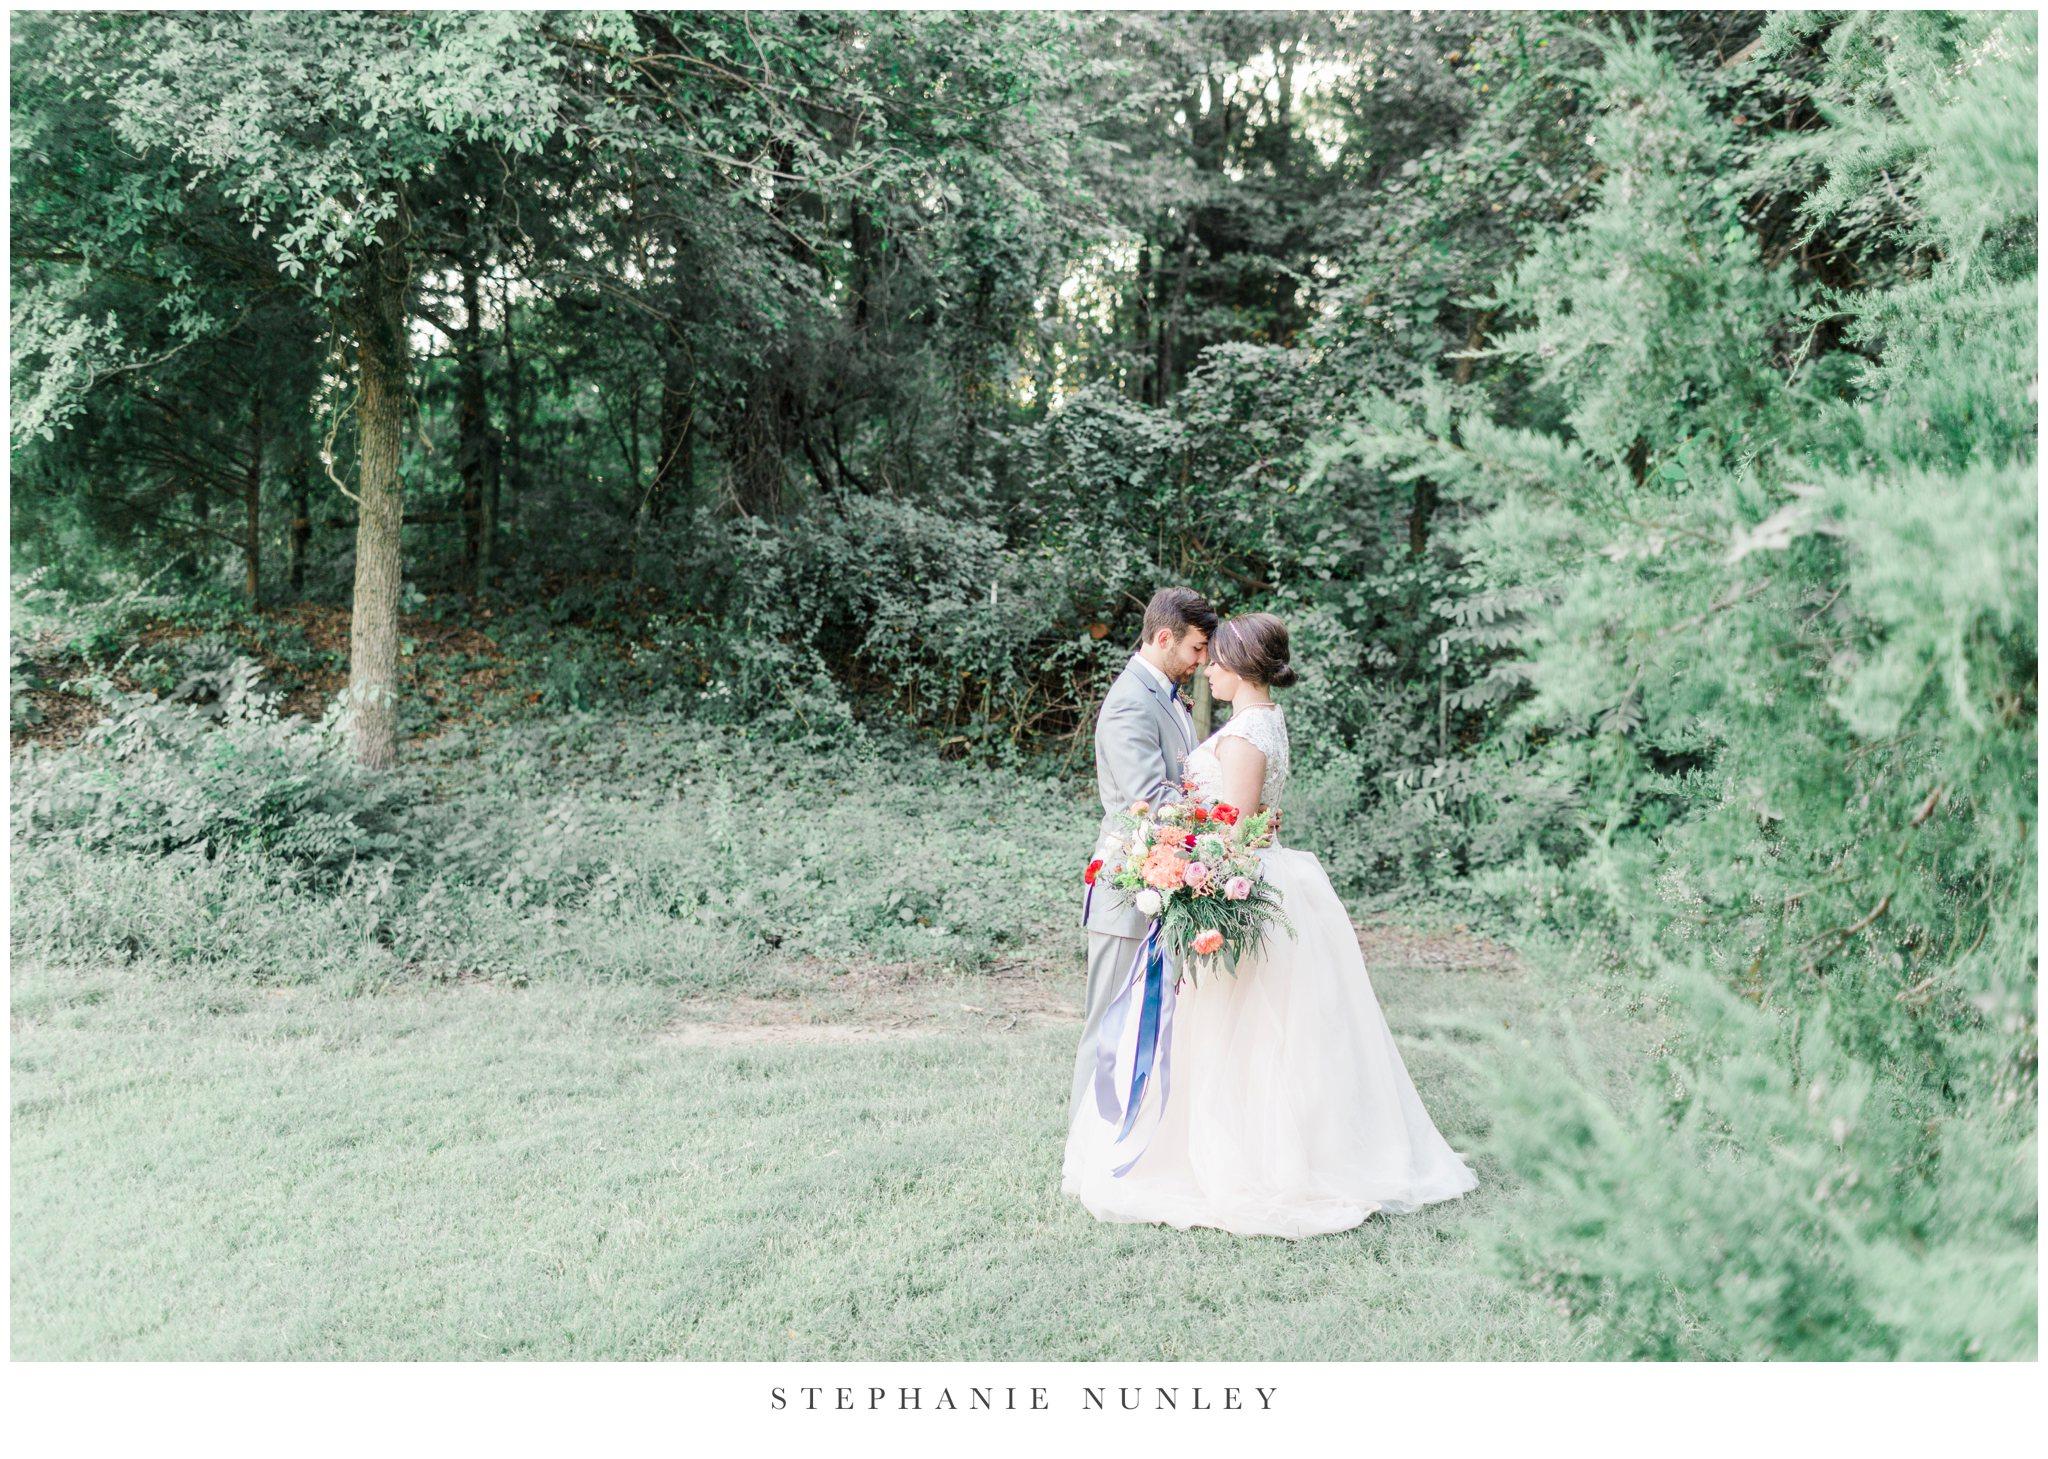 arkansas-wedding-with-lush-wildflower-bouquet-0124.jpg